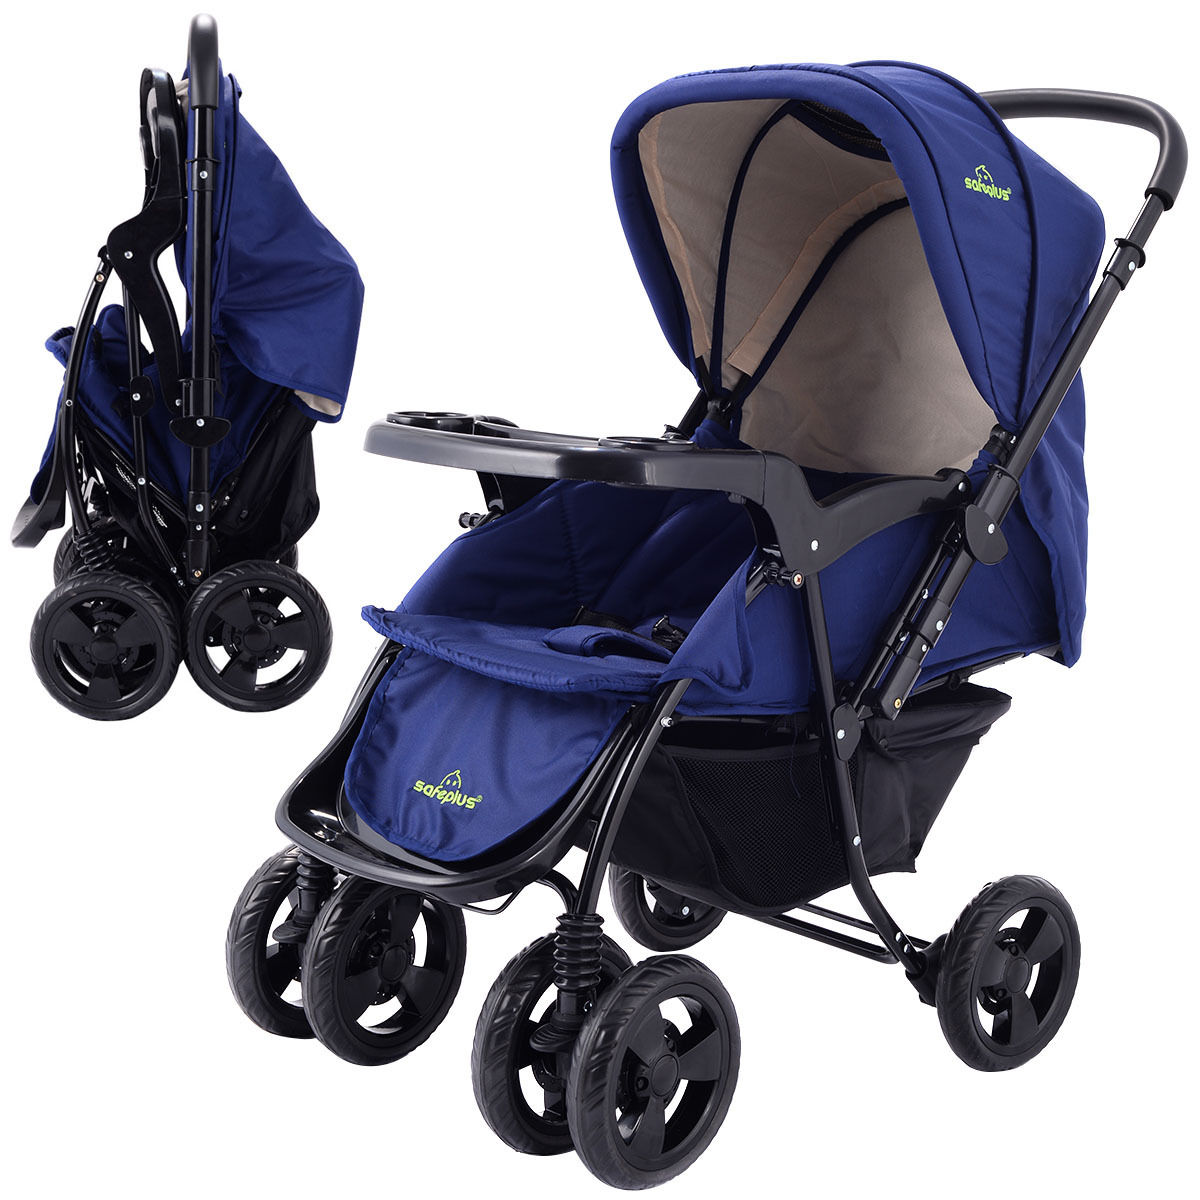 foldable two way stroller baby newborn infant kids travel buggy pushchair blue ebay. Black Bedroom Furniture Sets. Home Design Ideas